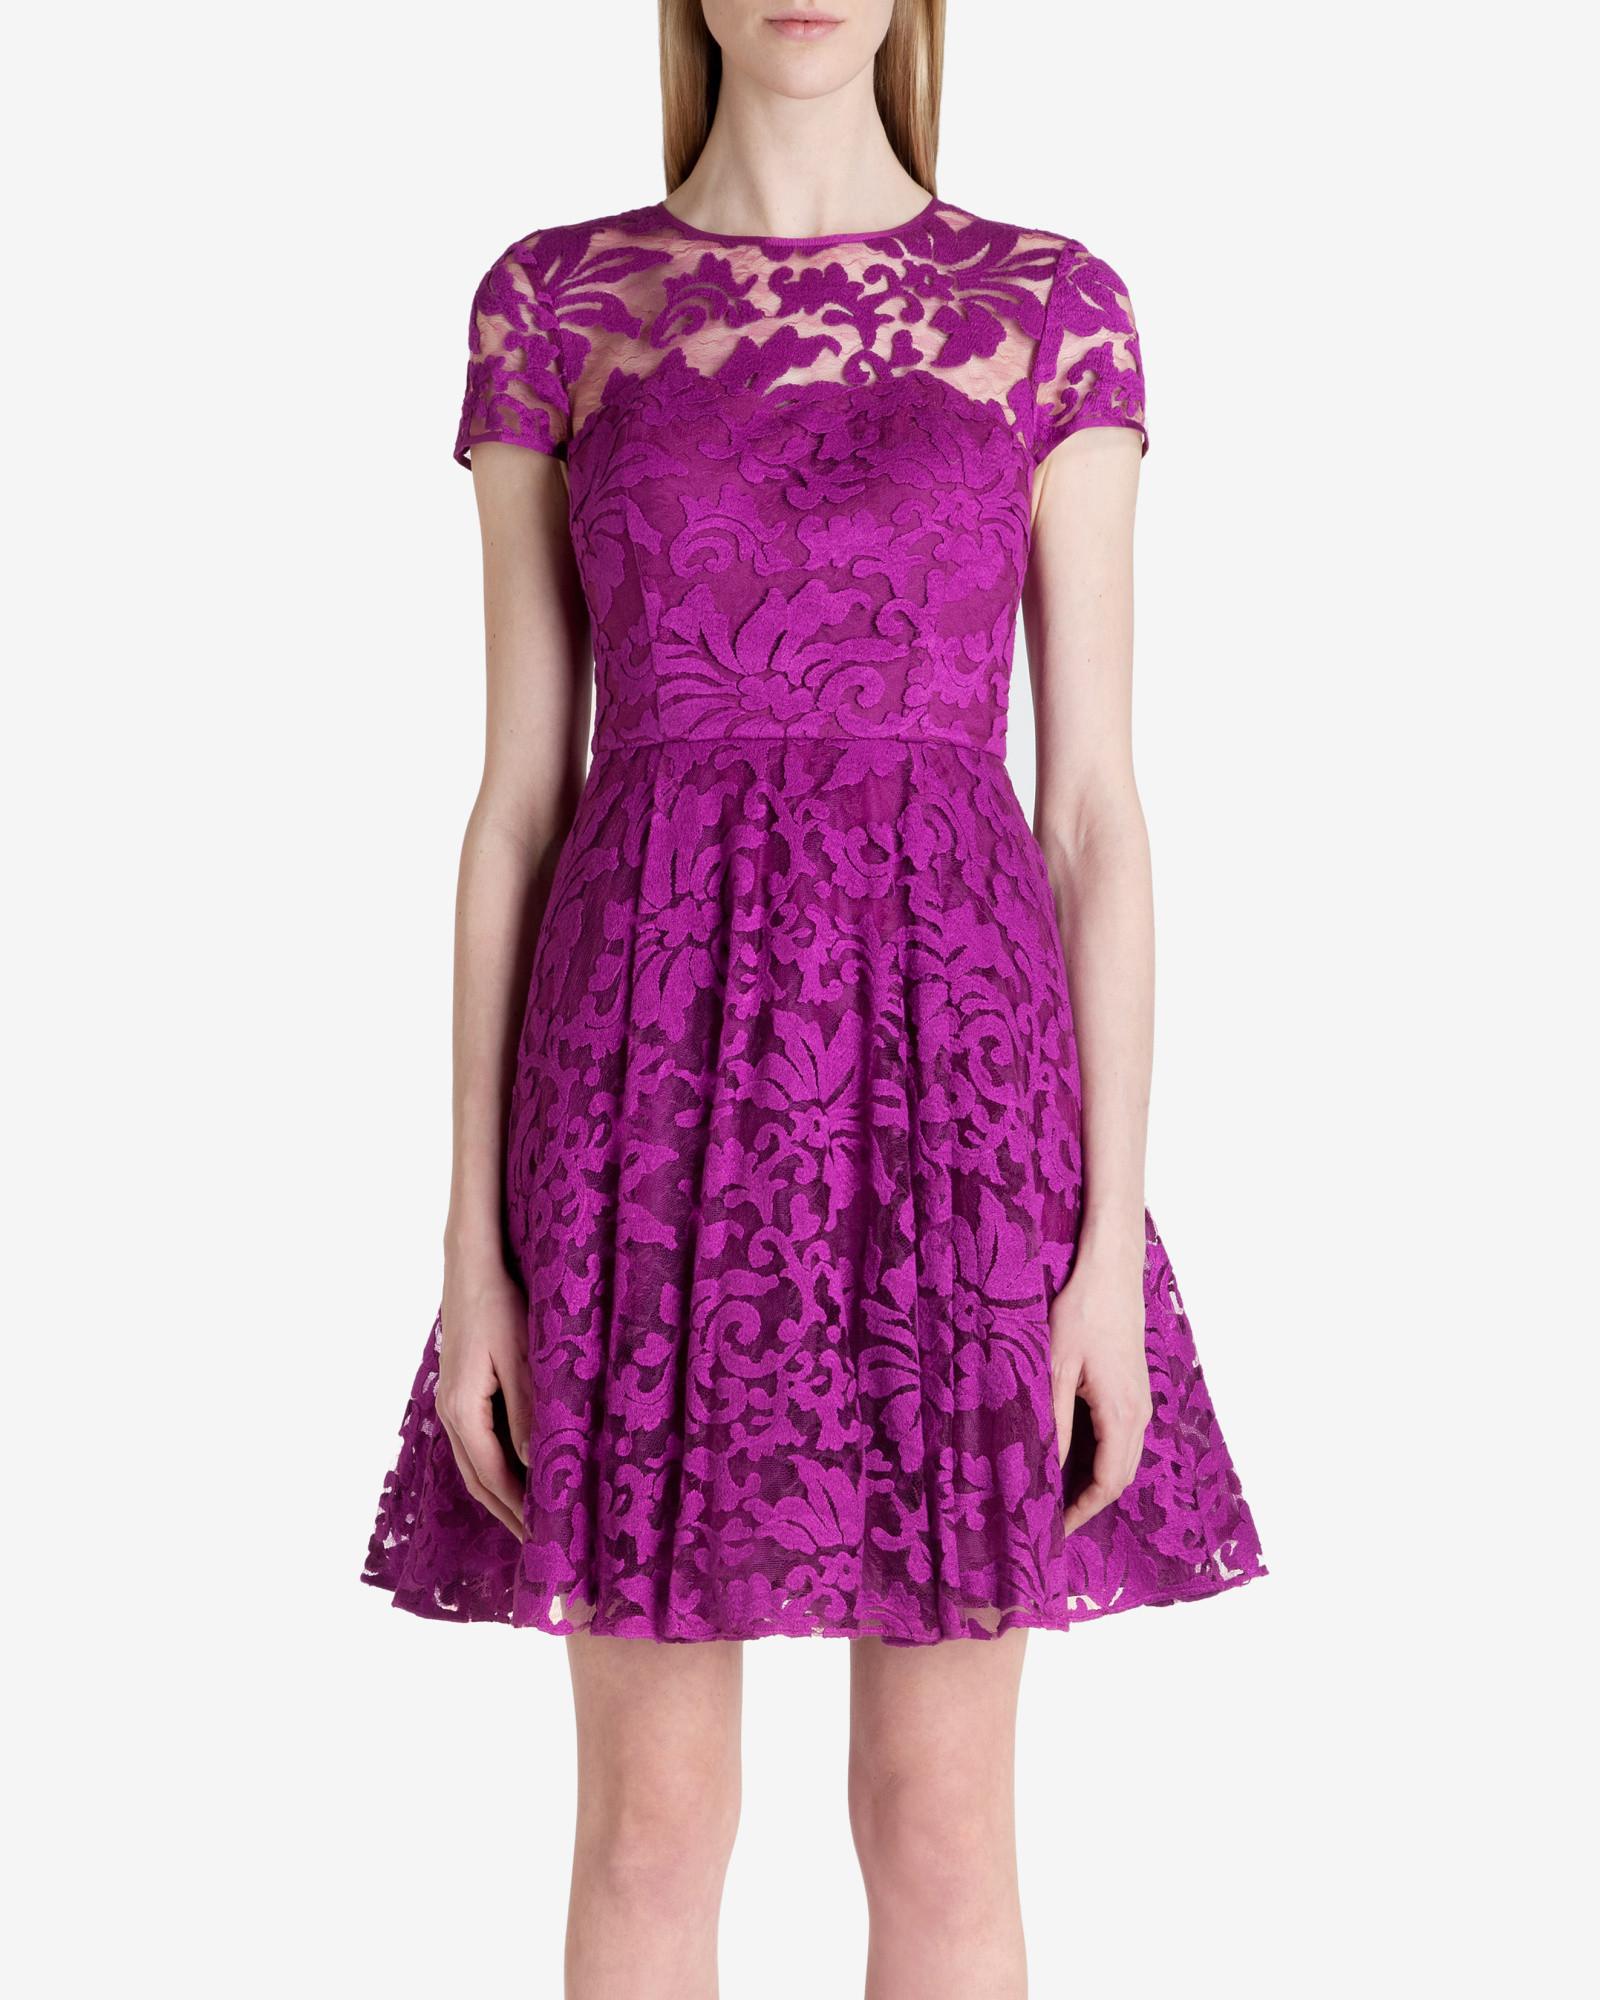 Magenta Lace Dresses